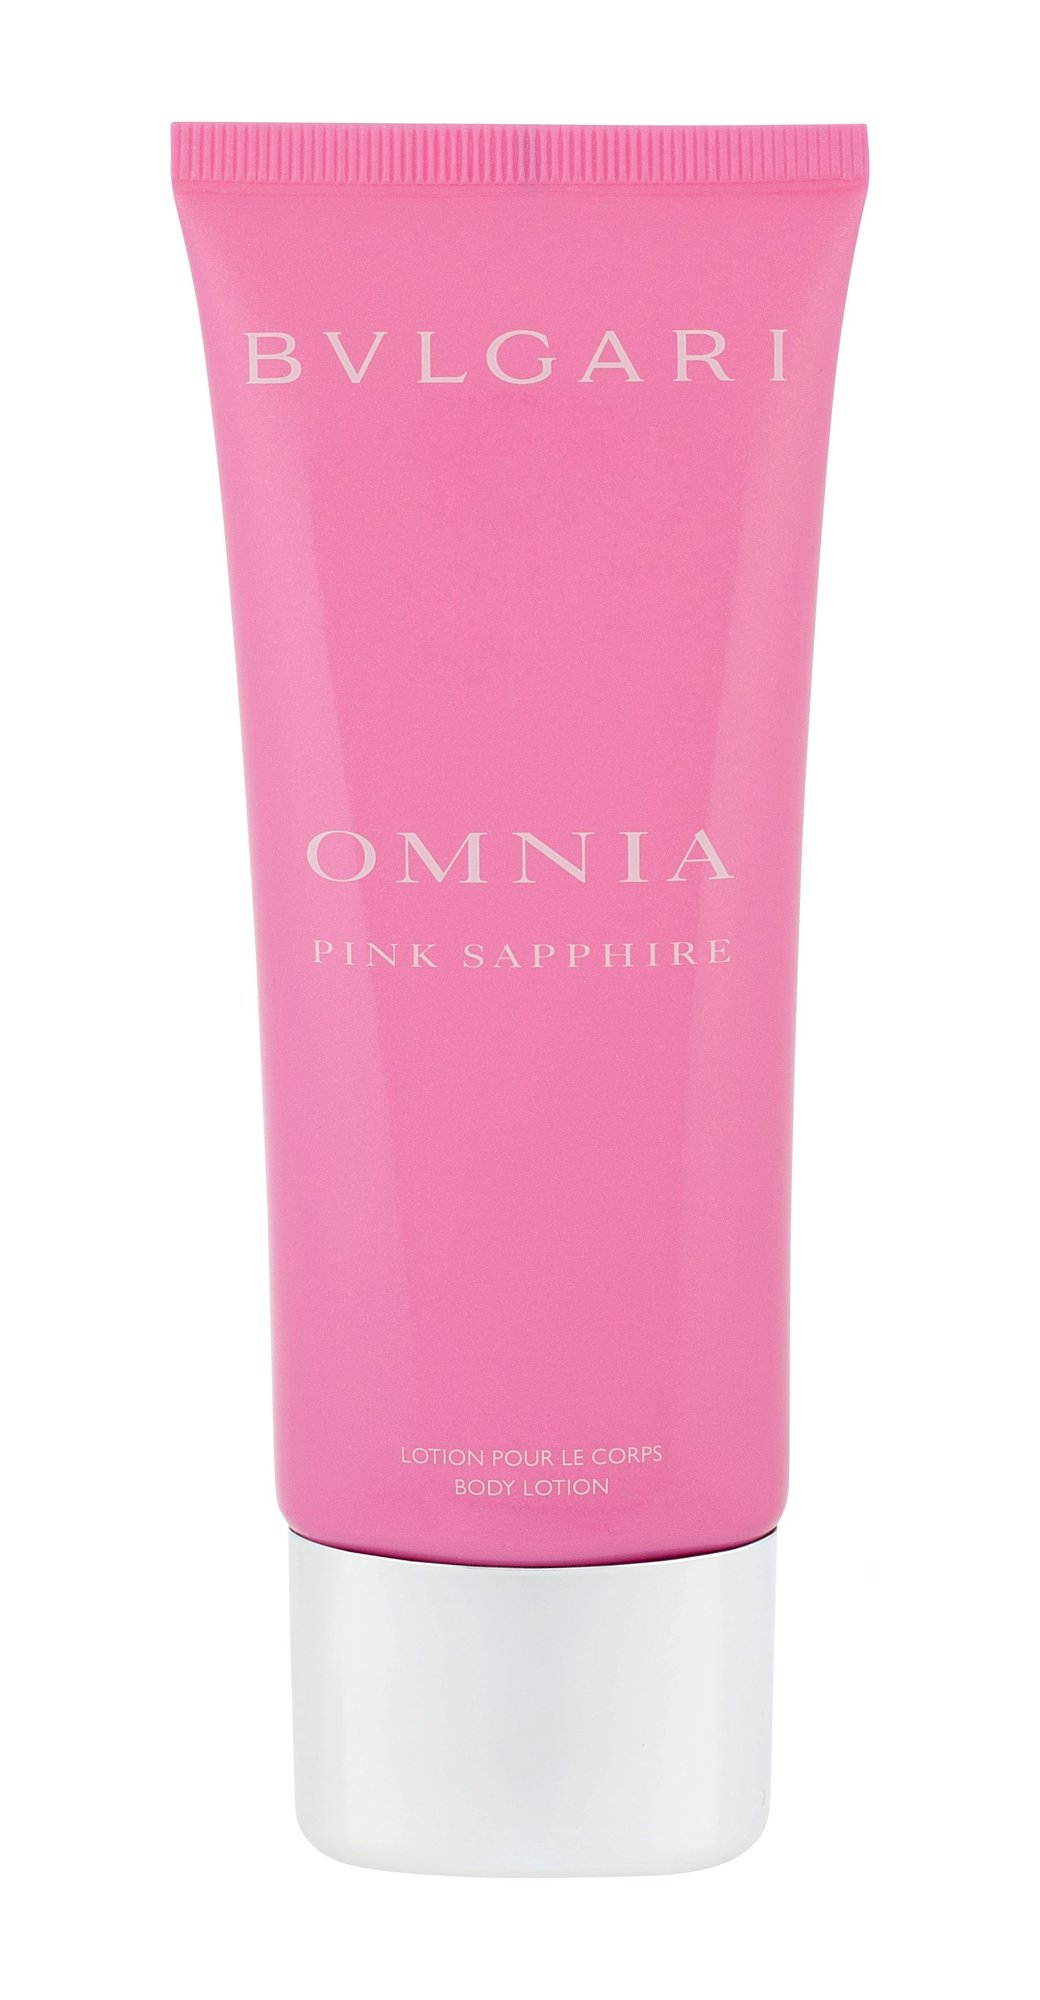 Bvlgari Omnia Pink Sapphire, Telové mlieko 100ml